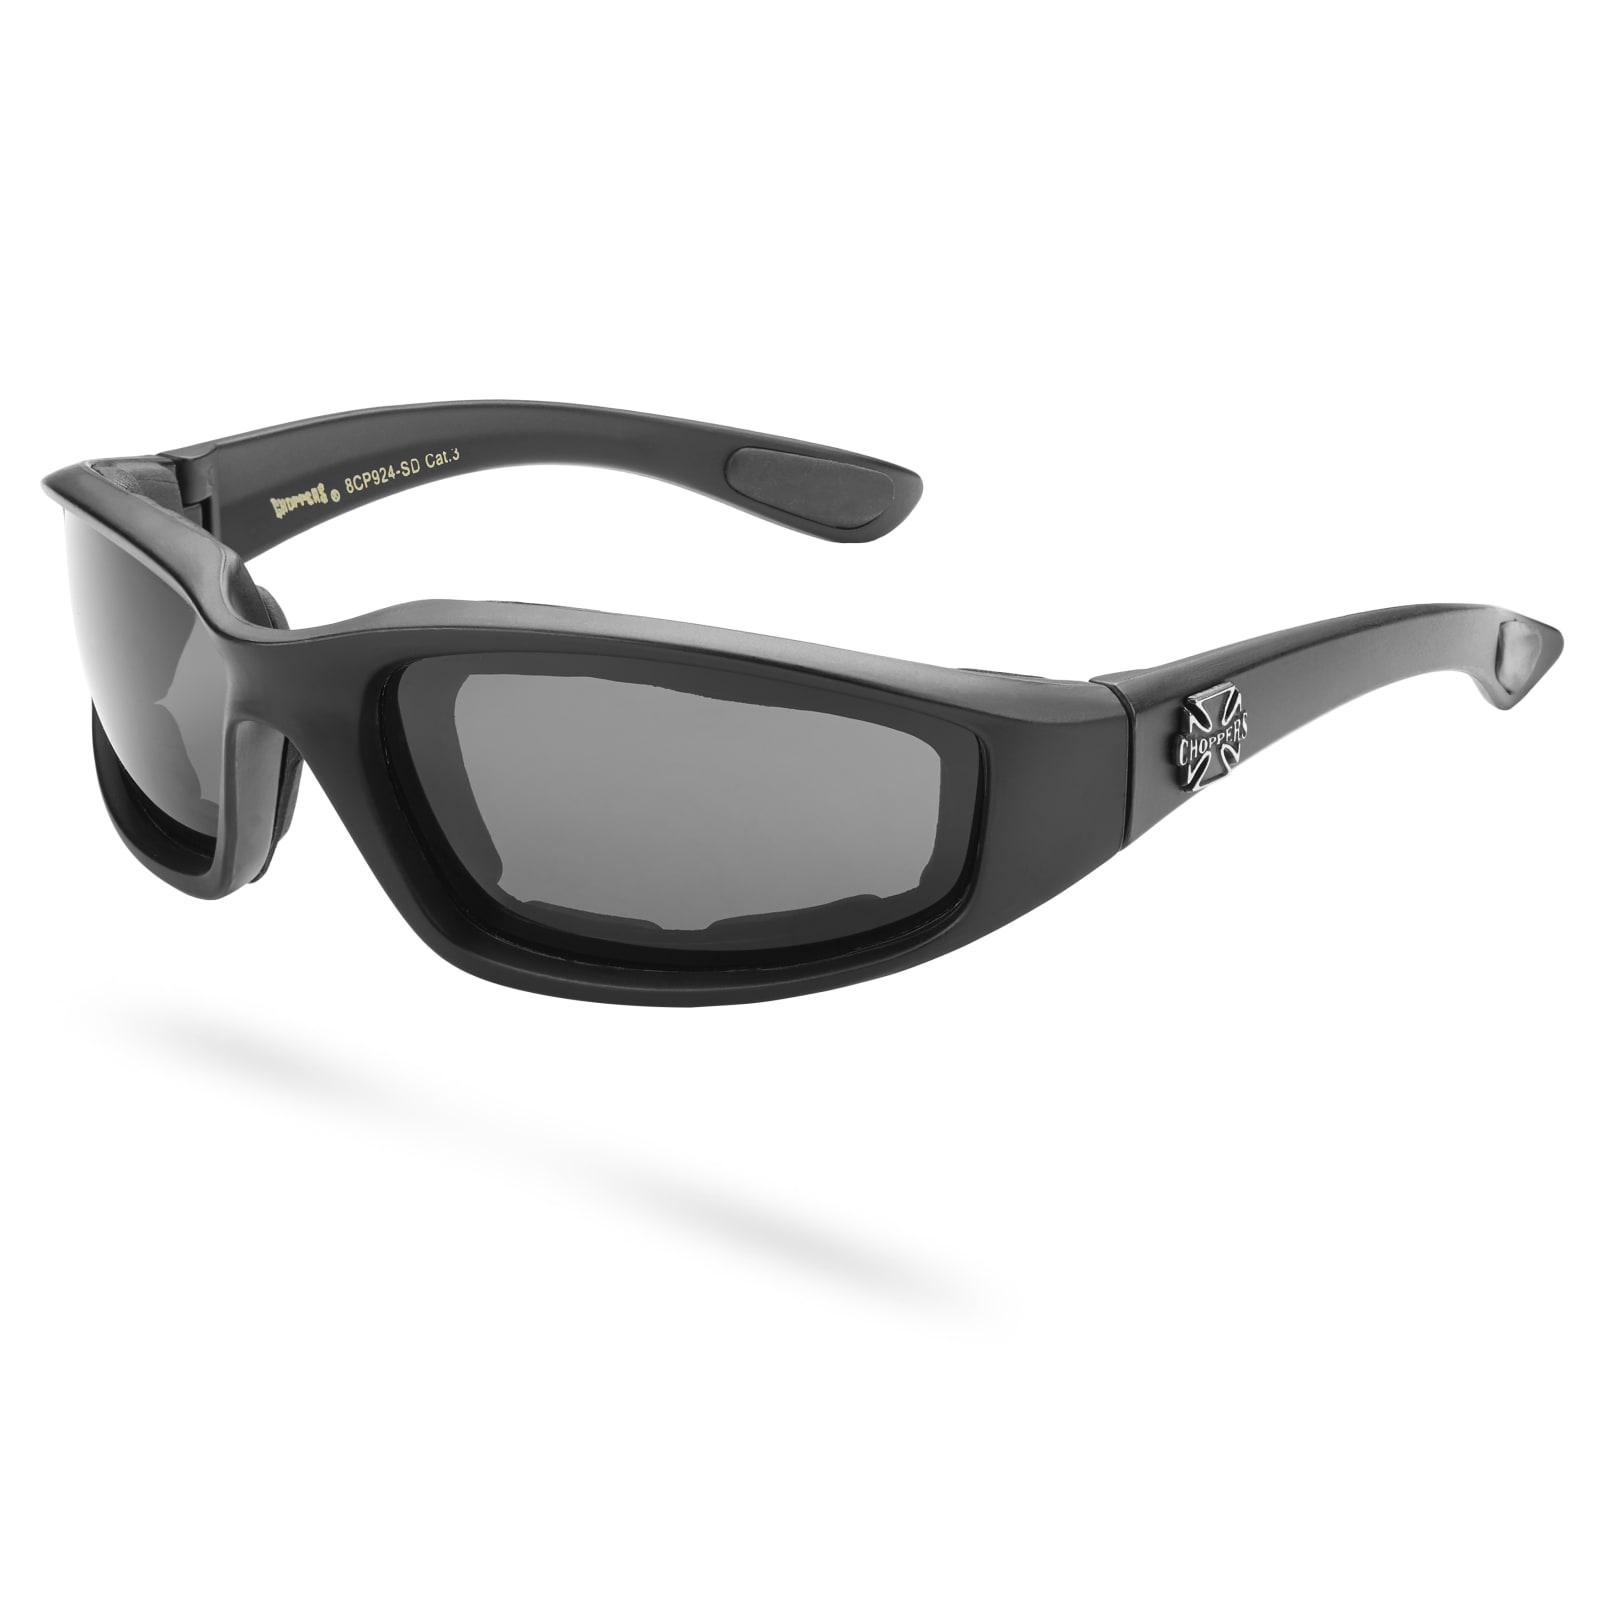 d956ff7475b Γυαλιά Ηλίου Black & Smoke